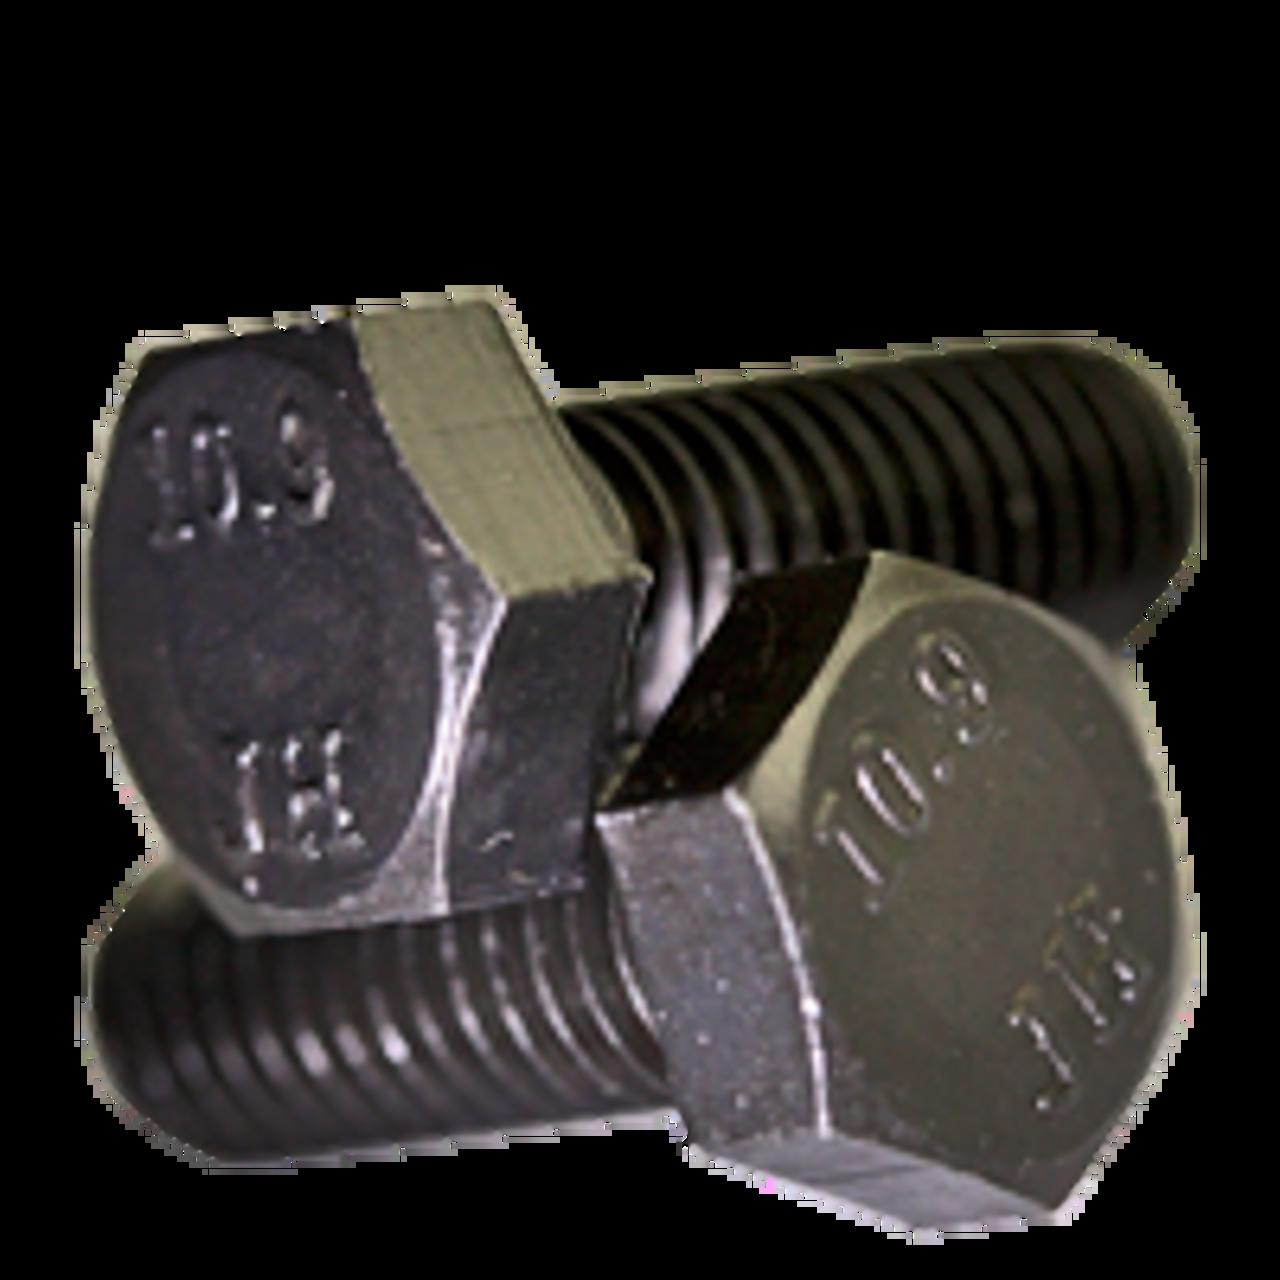 FT M8 x 1.00 x 20 MM Black Bolt Fine Class 10.9 Hex Cap Screw